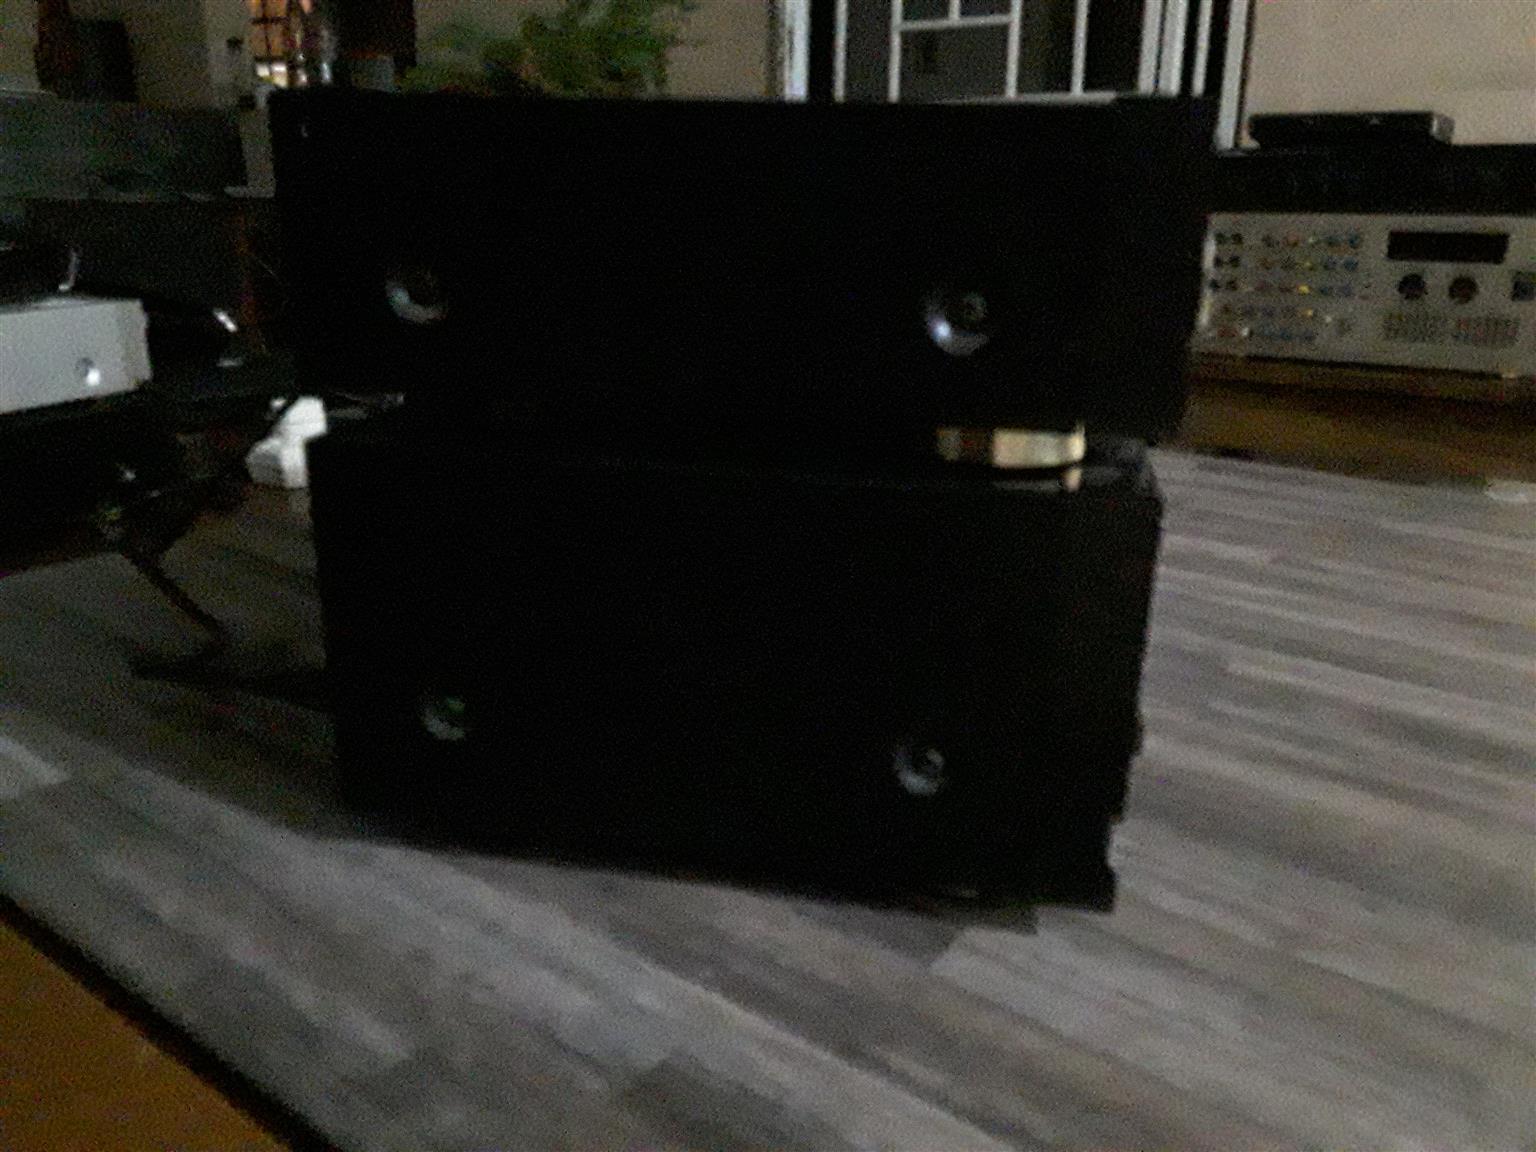 Sherwood Tuner & Tape Deck